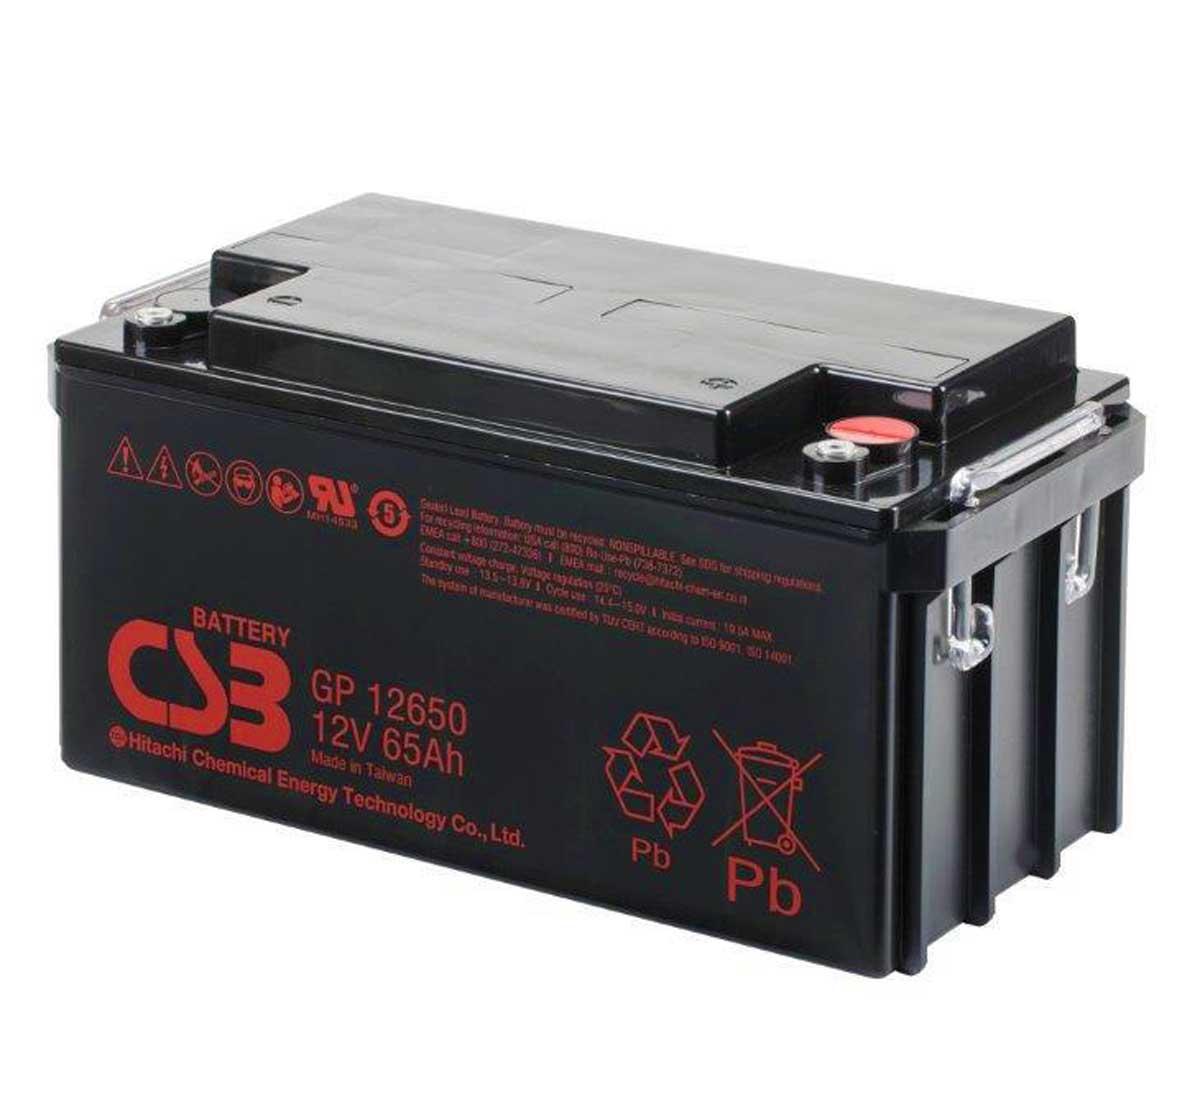 310w solar panel (poly) R1799